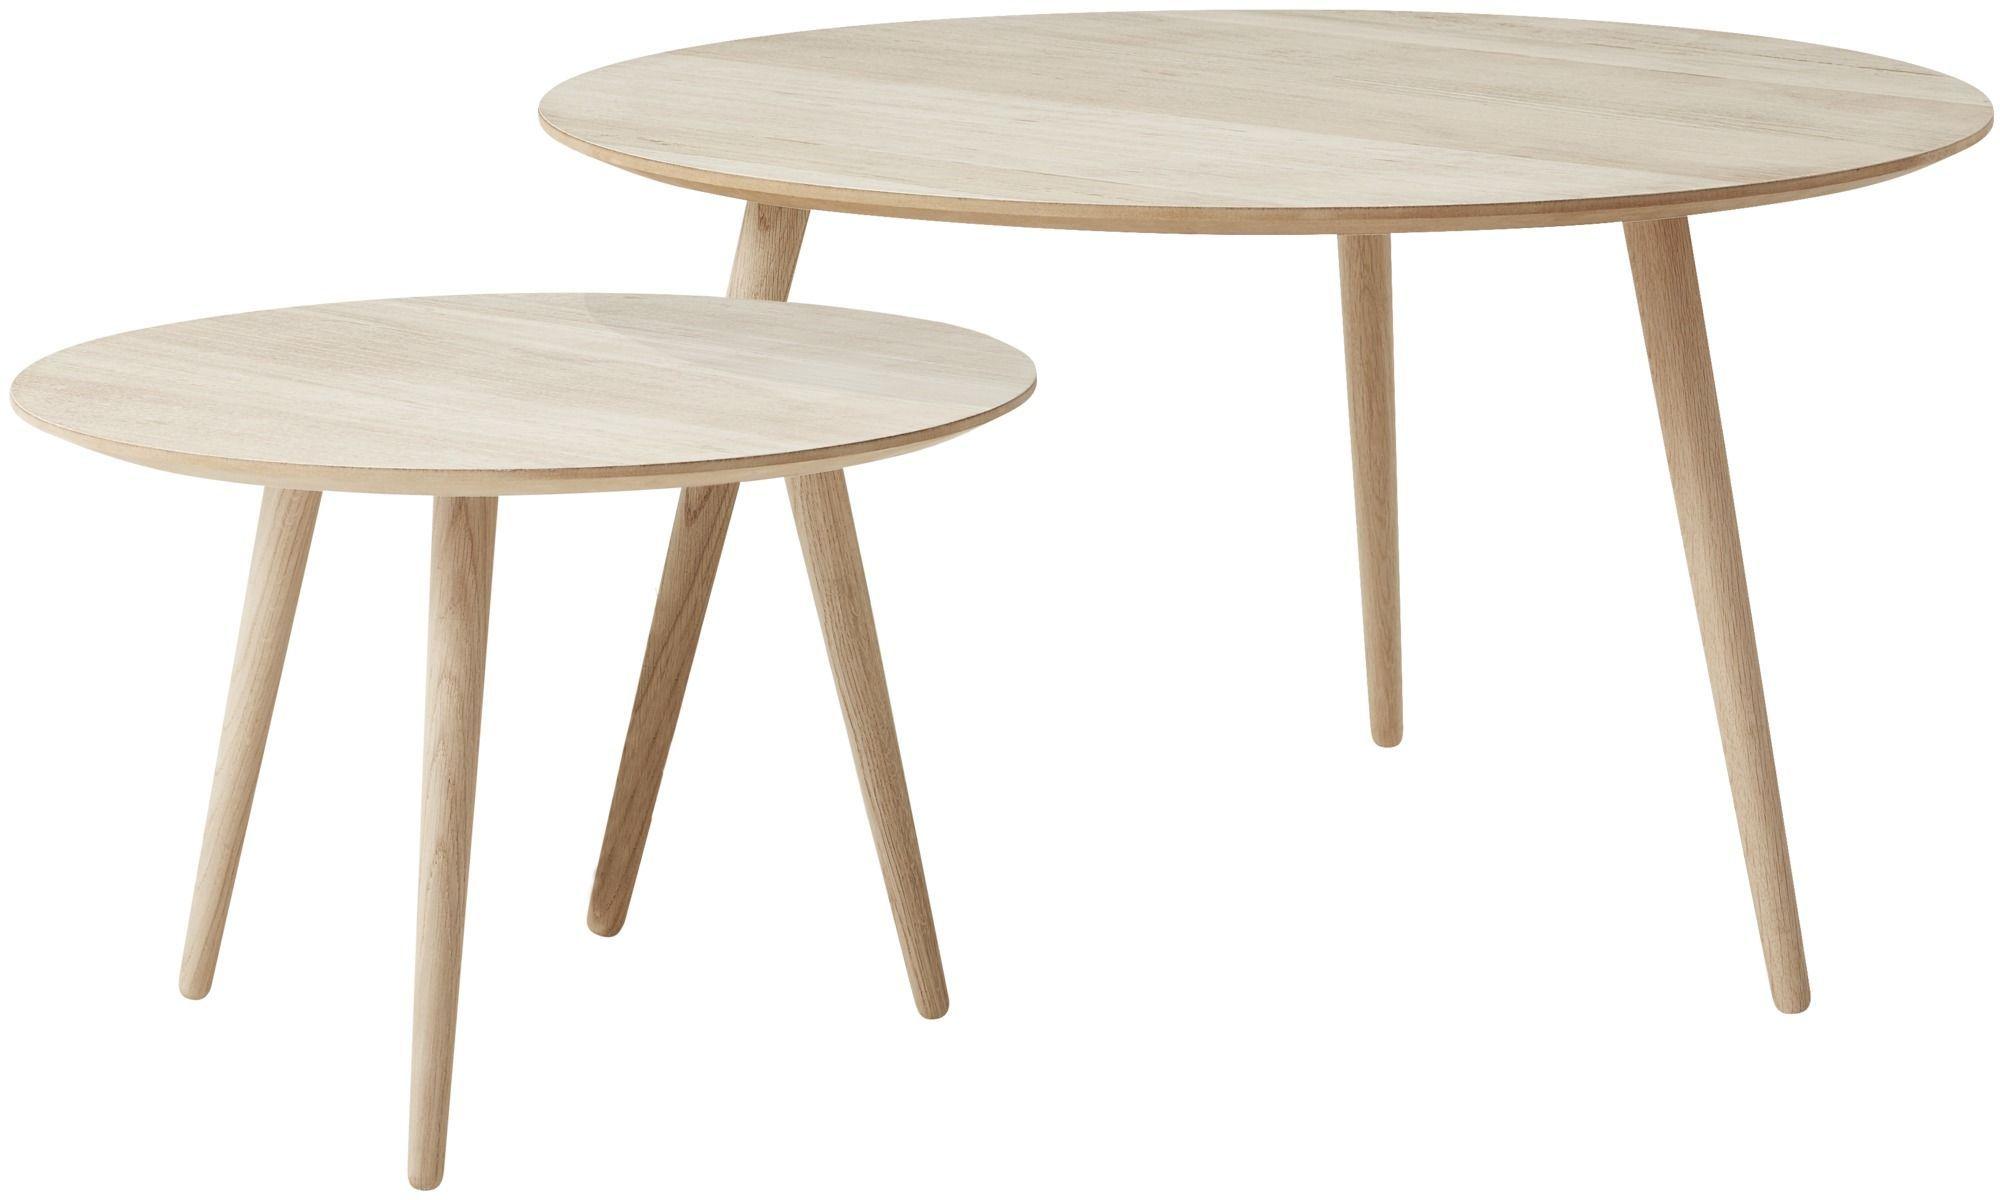 Coffee Tables Bornholm Coffee Table Oak Coffee Table Coffee Table Coffee Table Pictures [ 1200 x 2000 Pixel ]